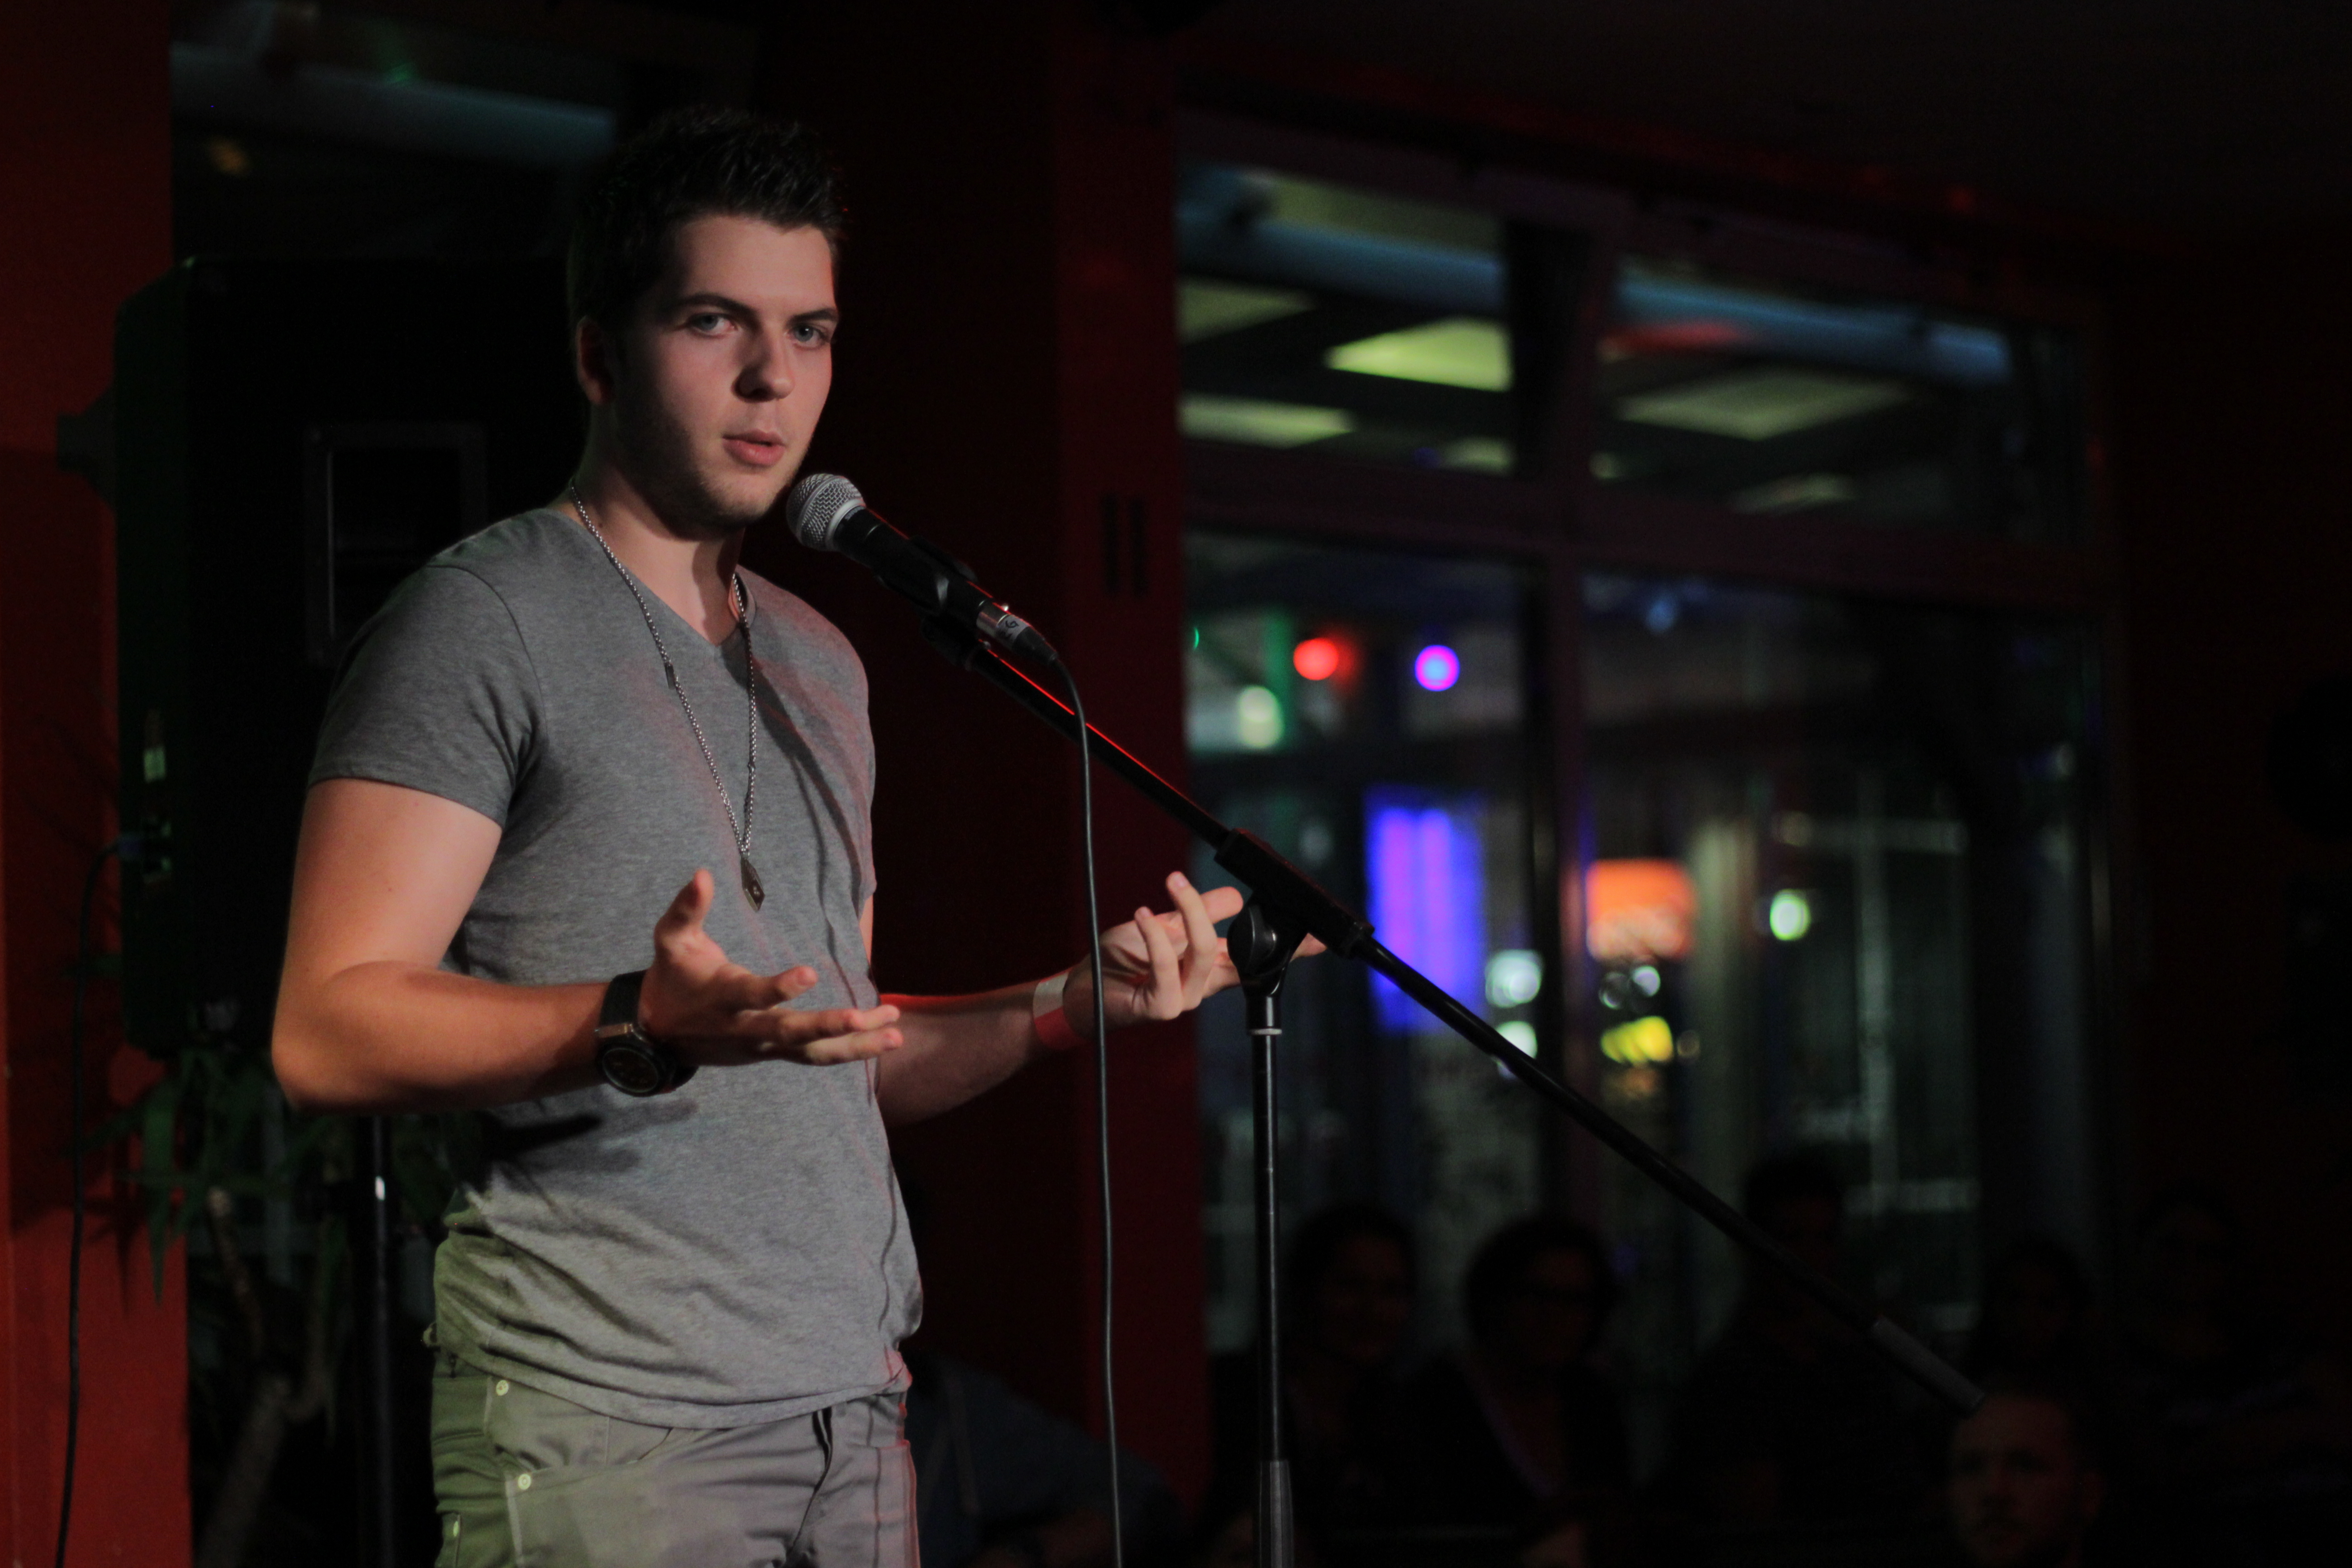 Alexander Straub Comedy Stand Up BK